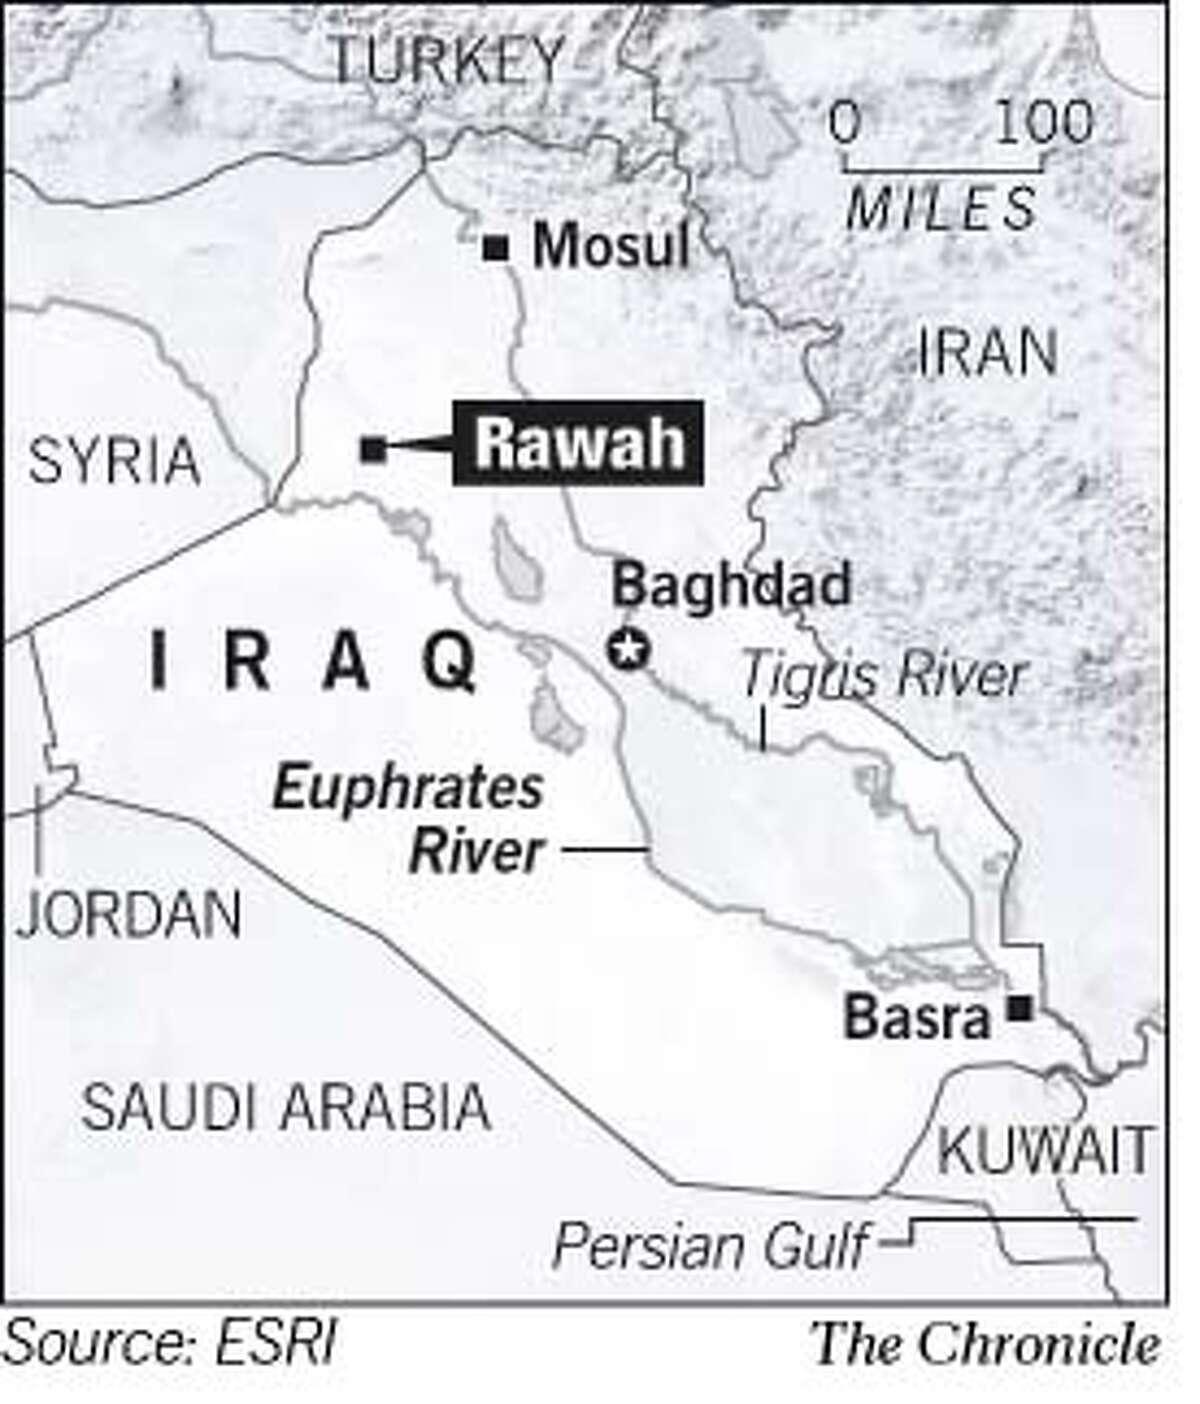 Rawah. Chronicle Graphic